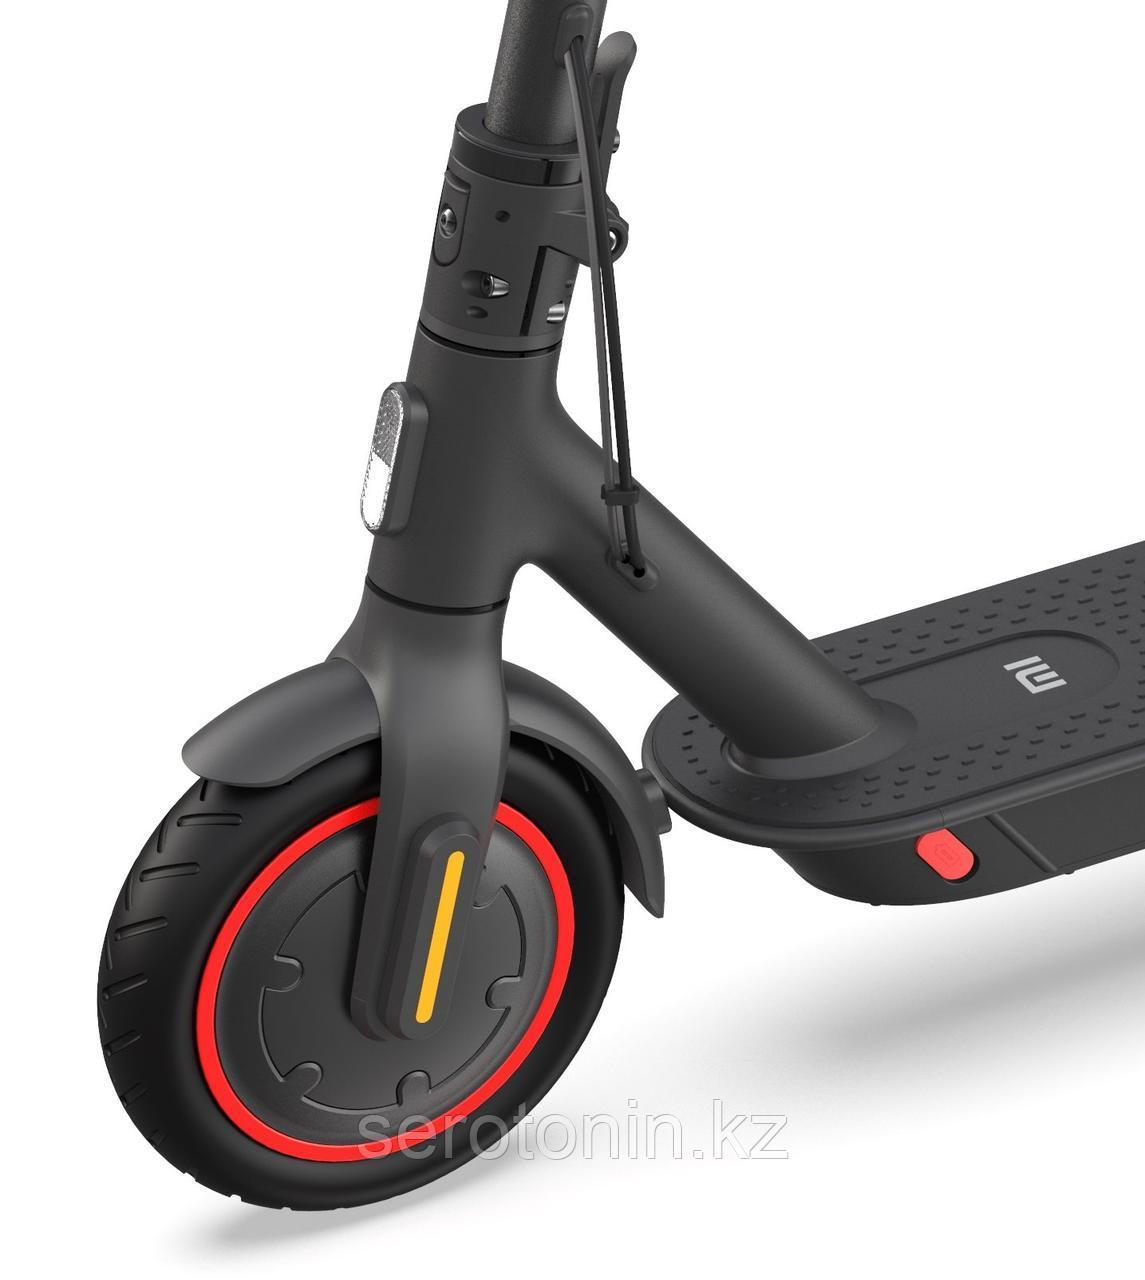 Электросамокат Xiaomi Mijia Electric Scooter M365 1S Black - фото 5